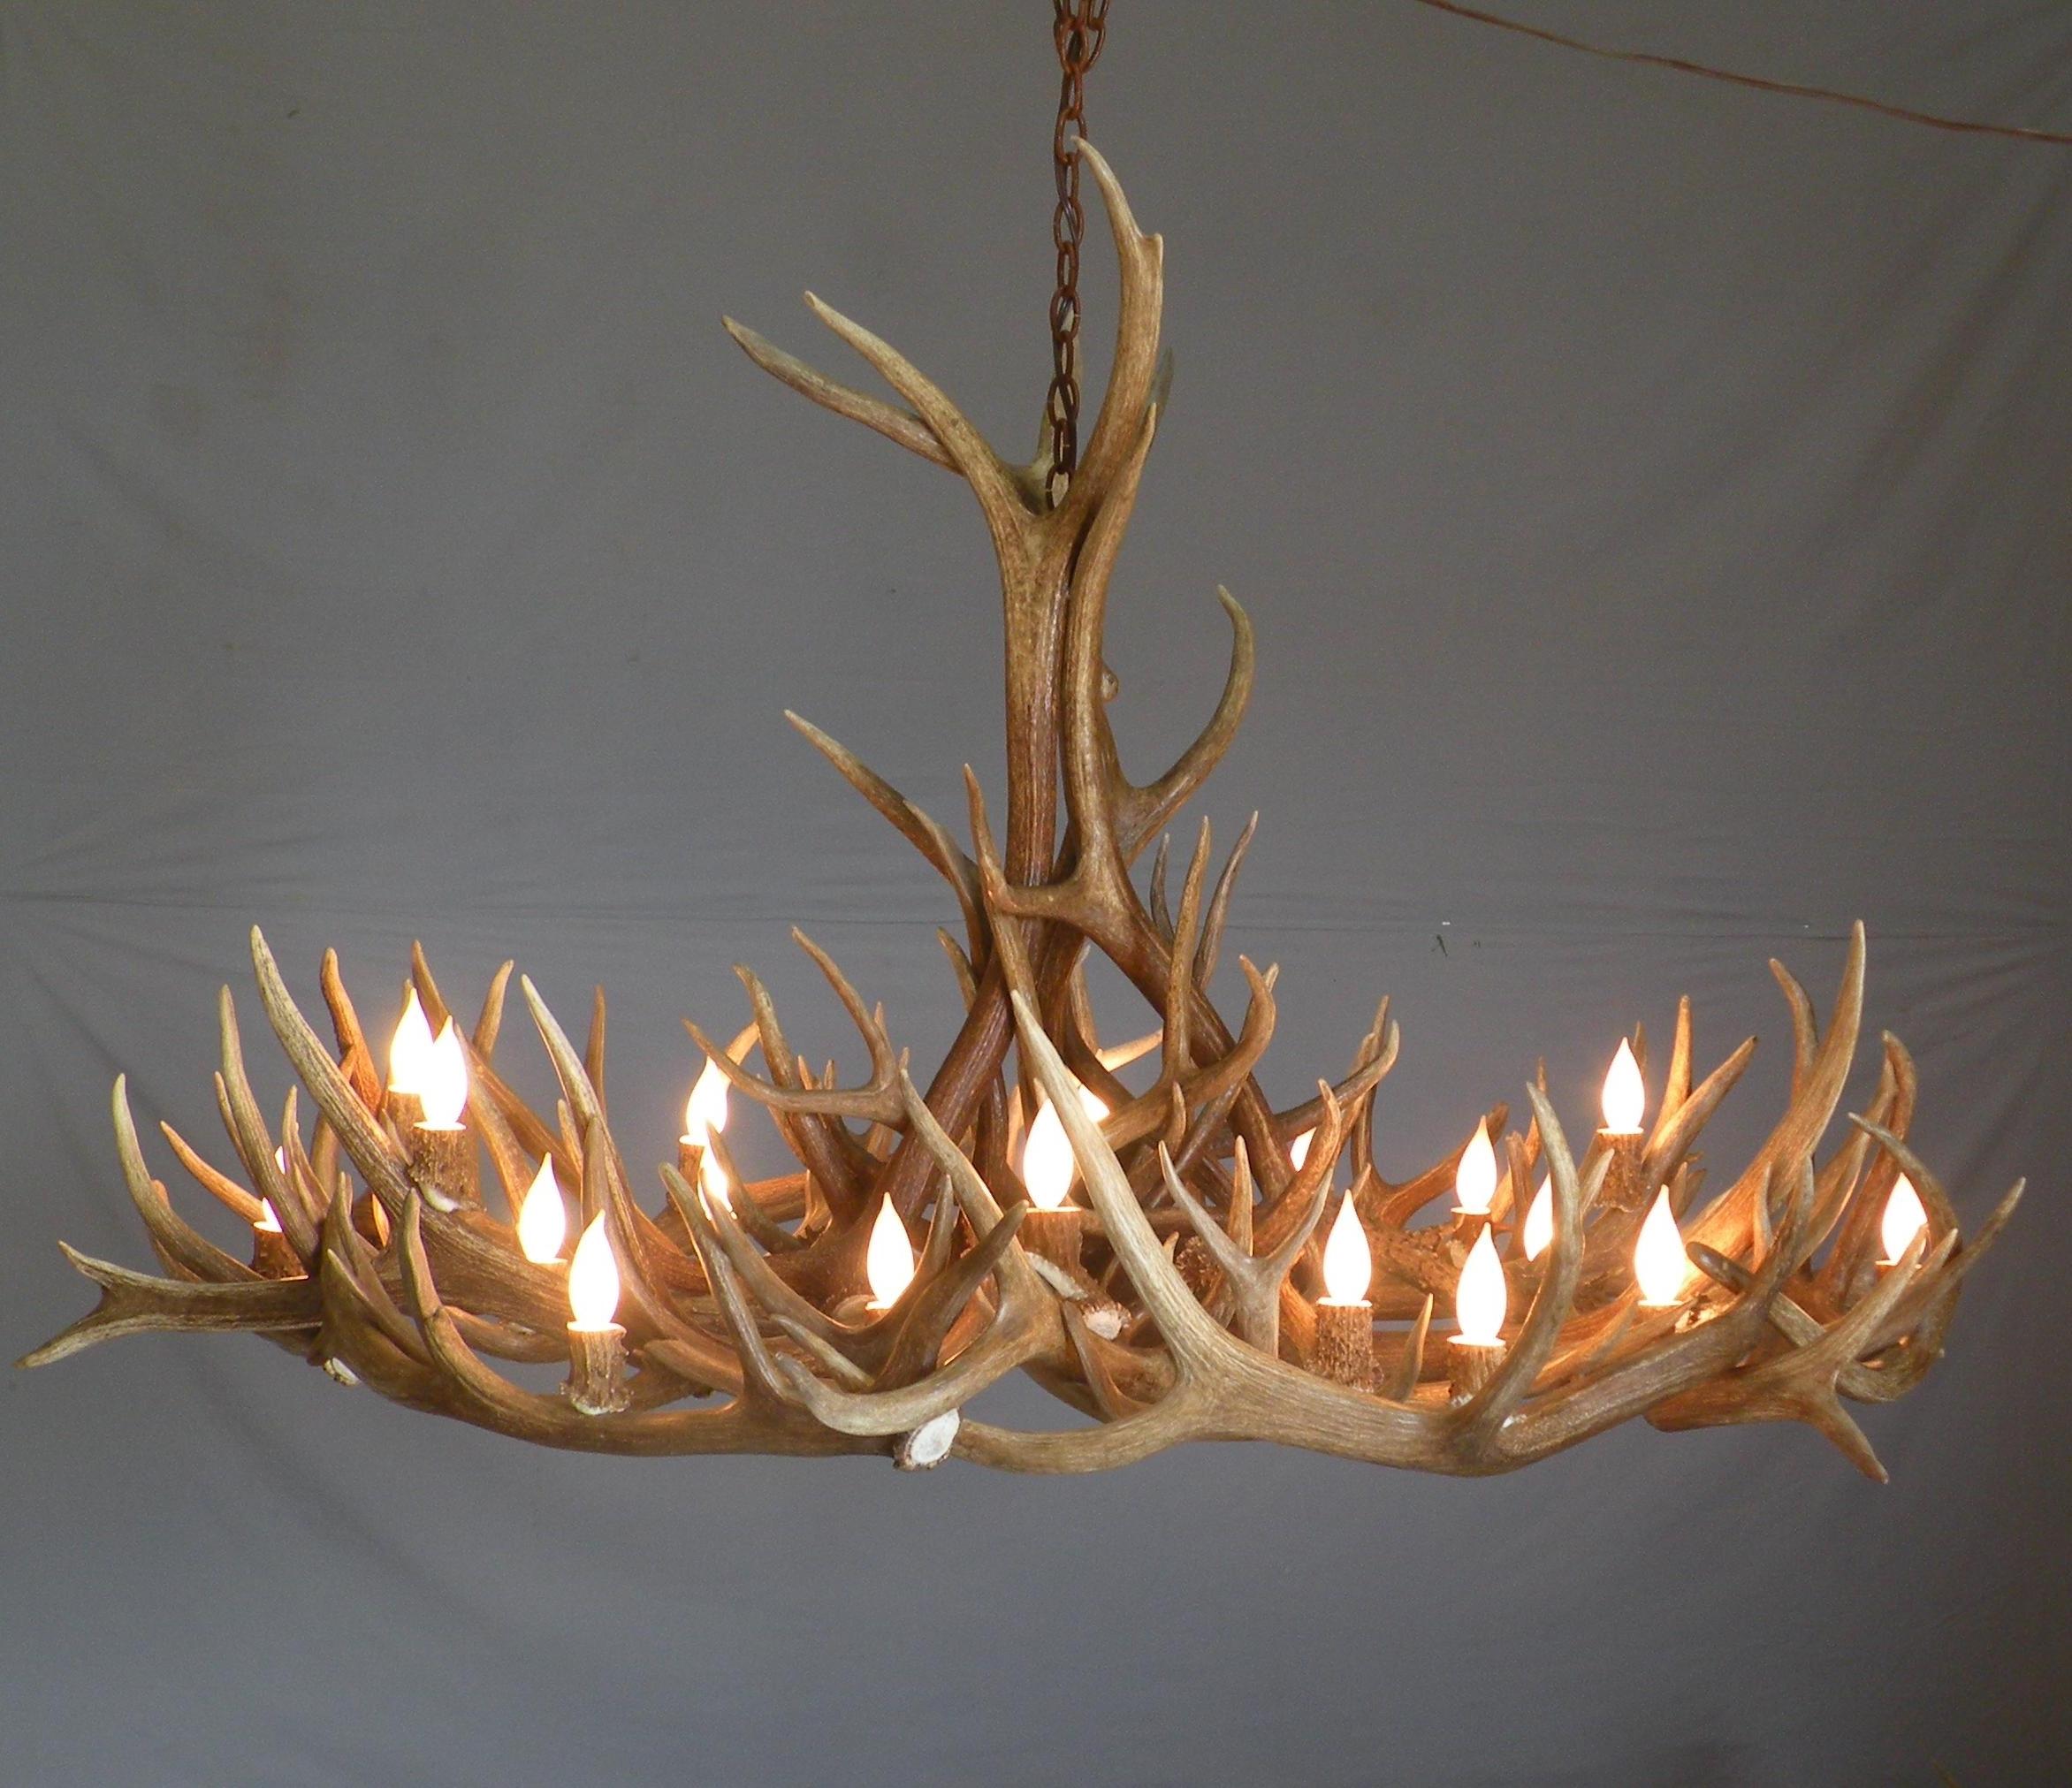 Stag Horn Chandelier In Well Known Lighting: Elk Antler Chandelier For Inspiring Unique Lighting Design (View 8 of 15)